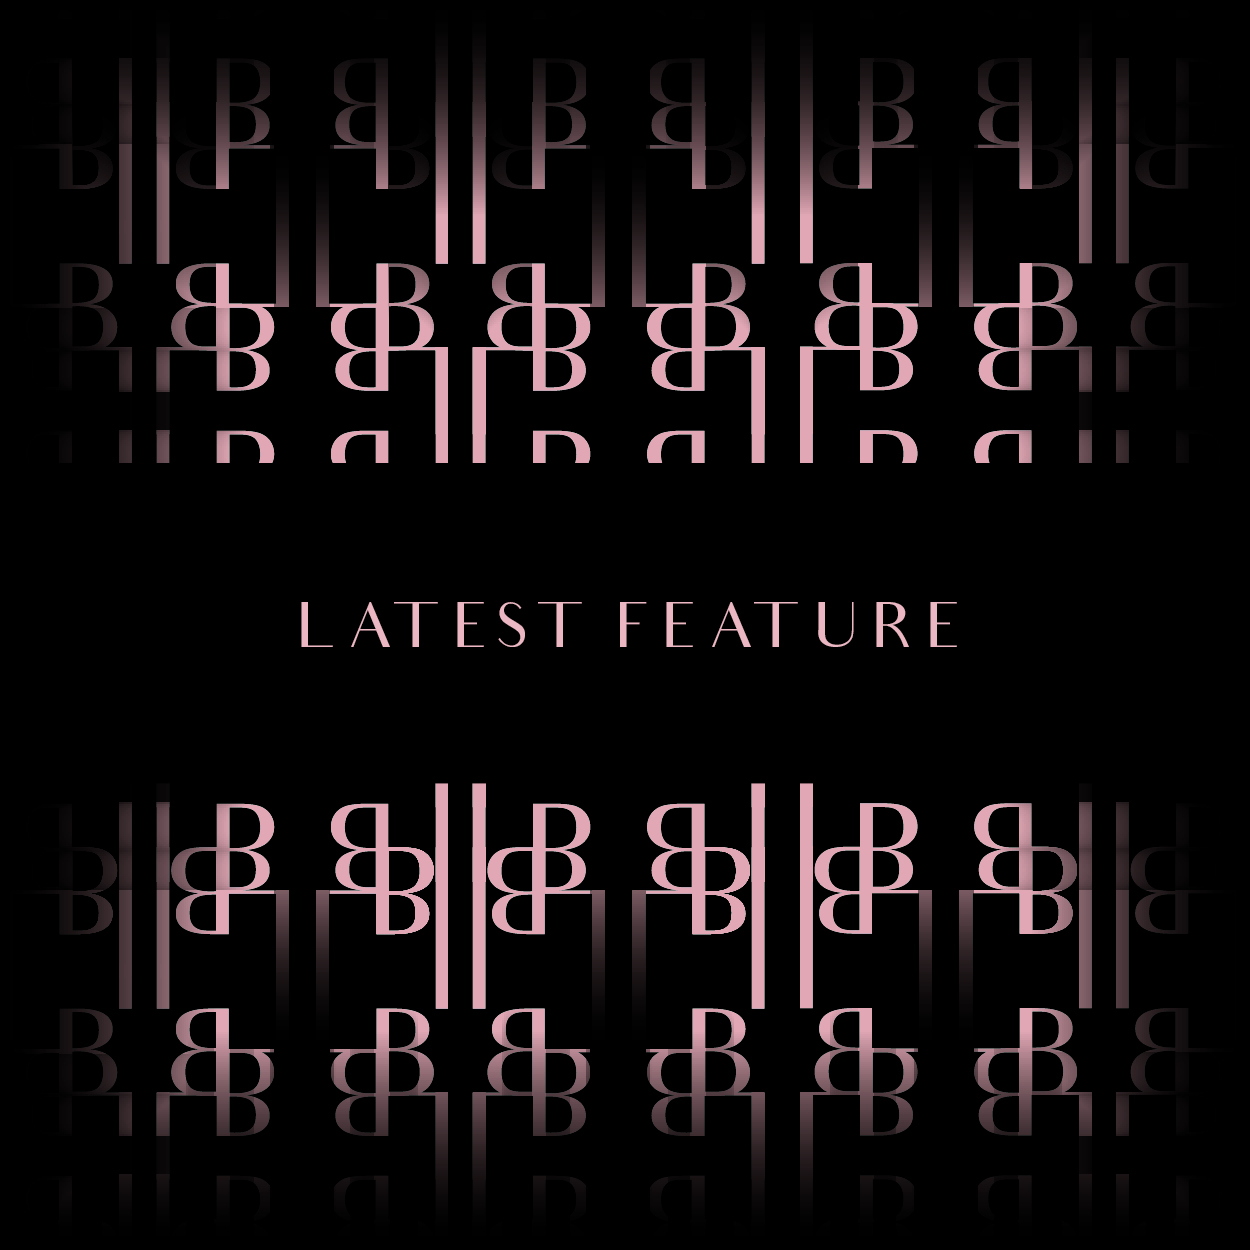 LBI_HoH_Insta_Squares8.jpg